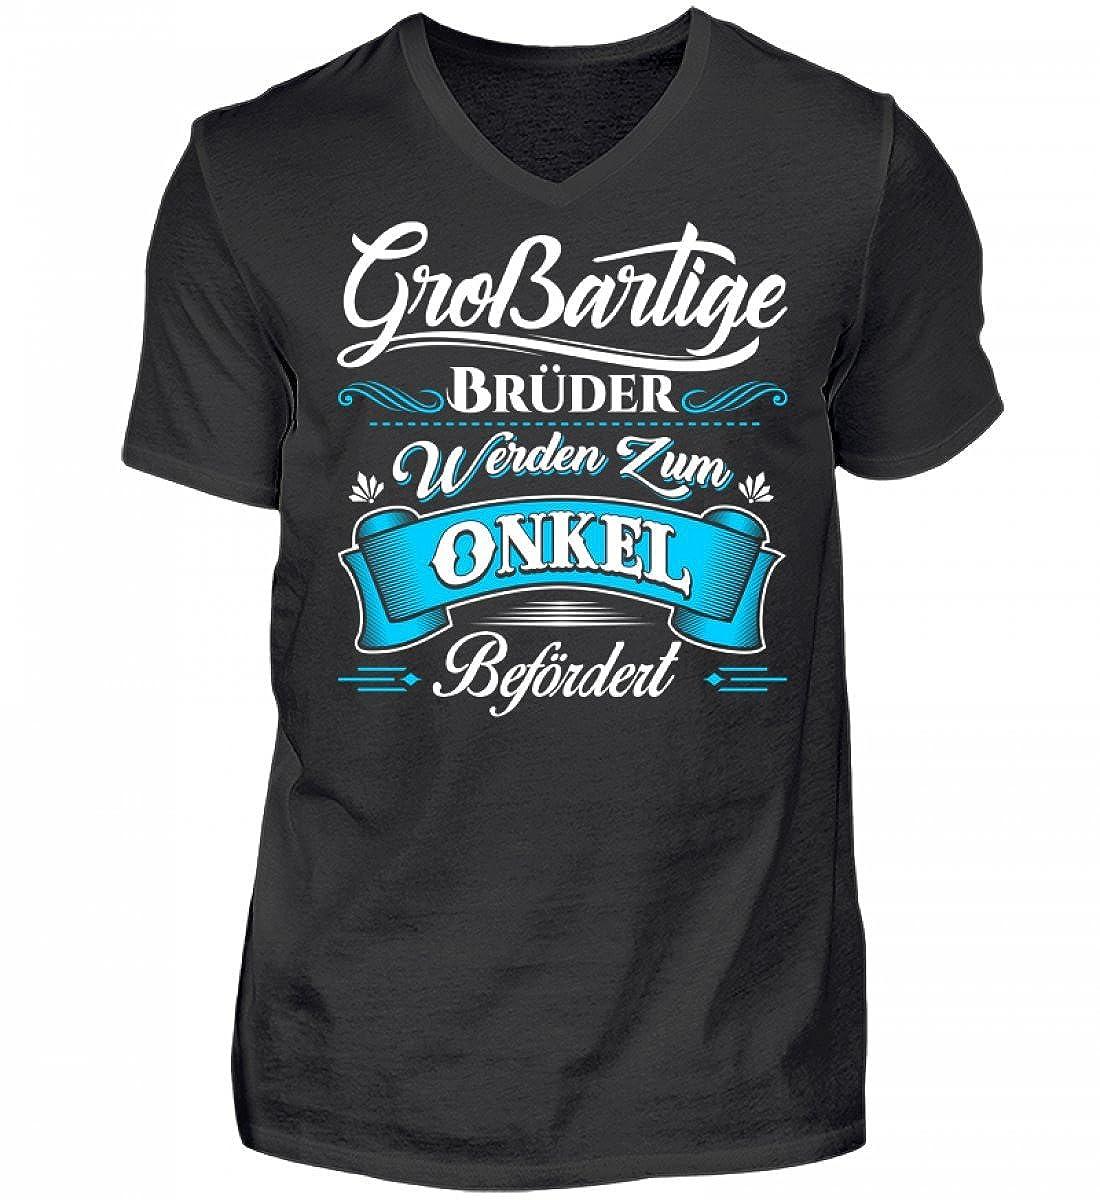 Hochwertiges Herren V-Neck Shirt - Großartiger Bruder Onkel Neffe ...